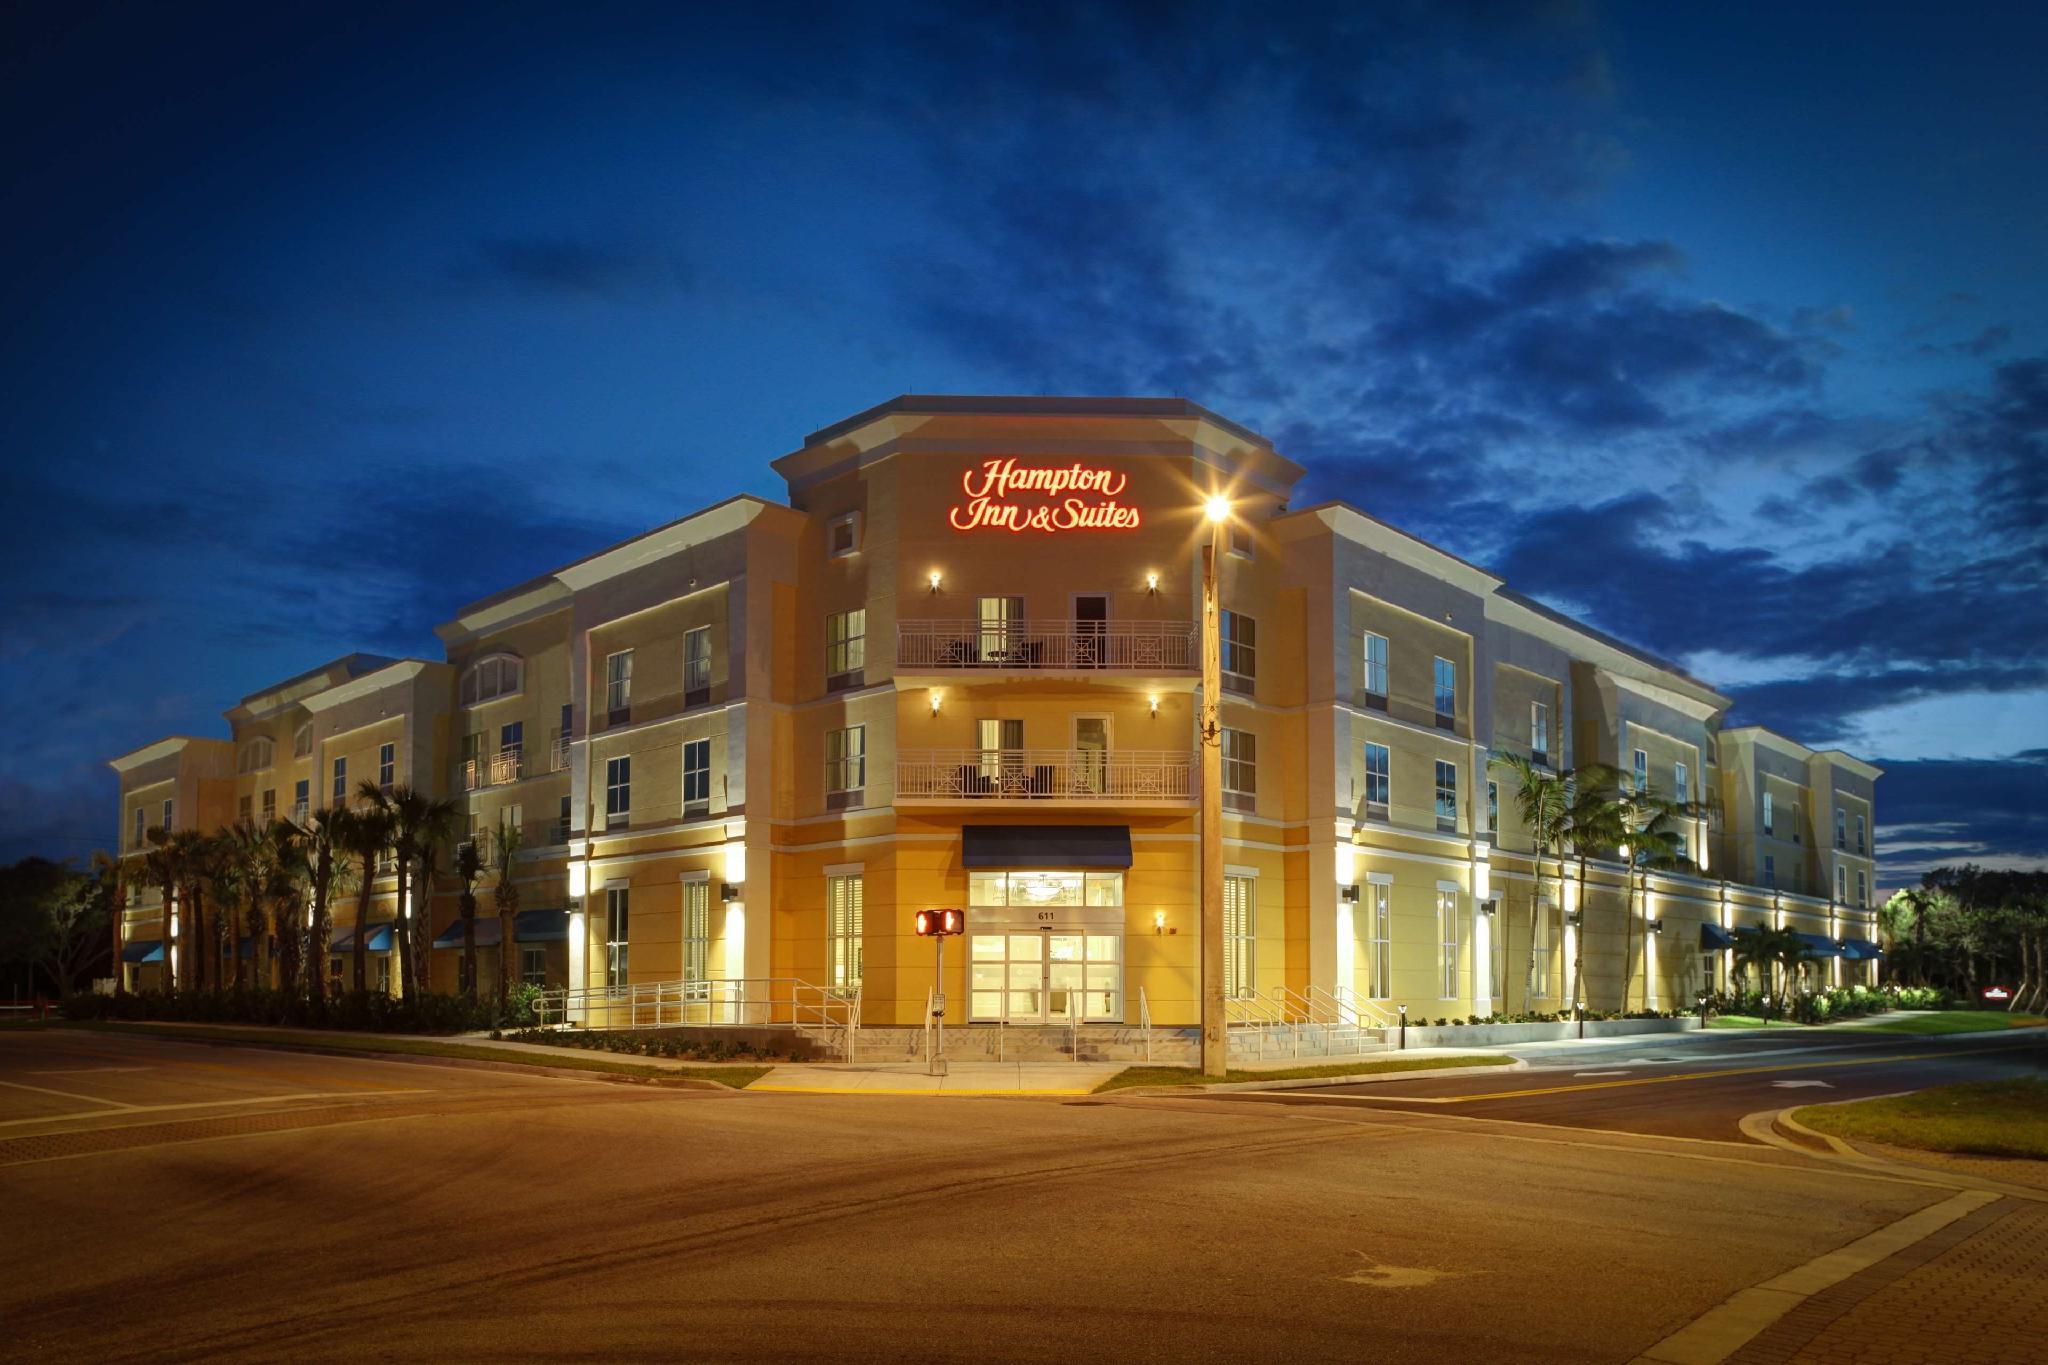 Hampton Inn And Suites Vero Beach Downtown